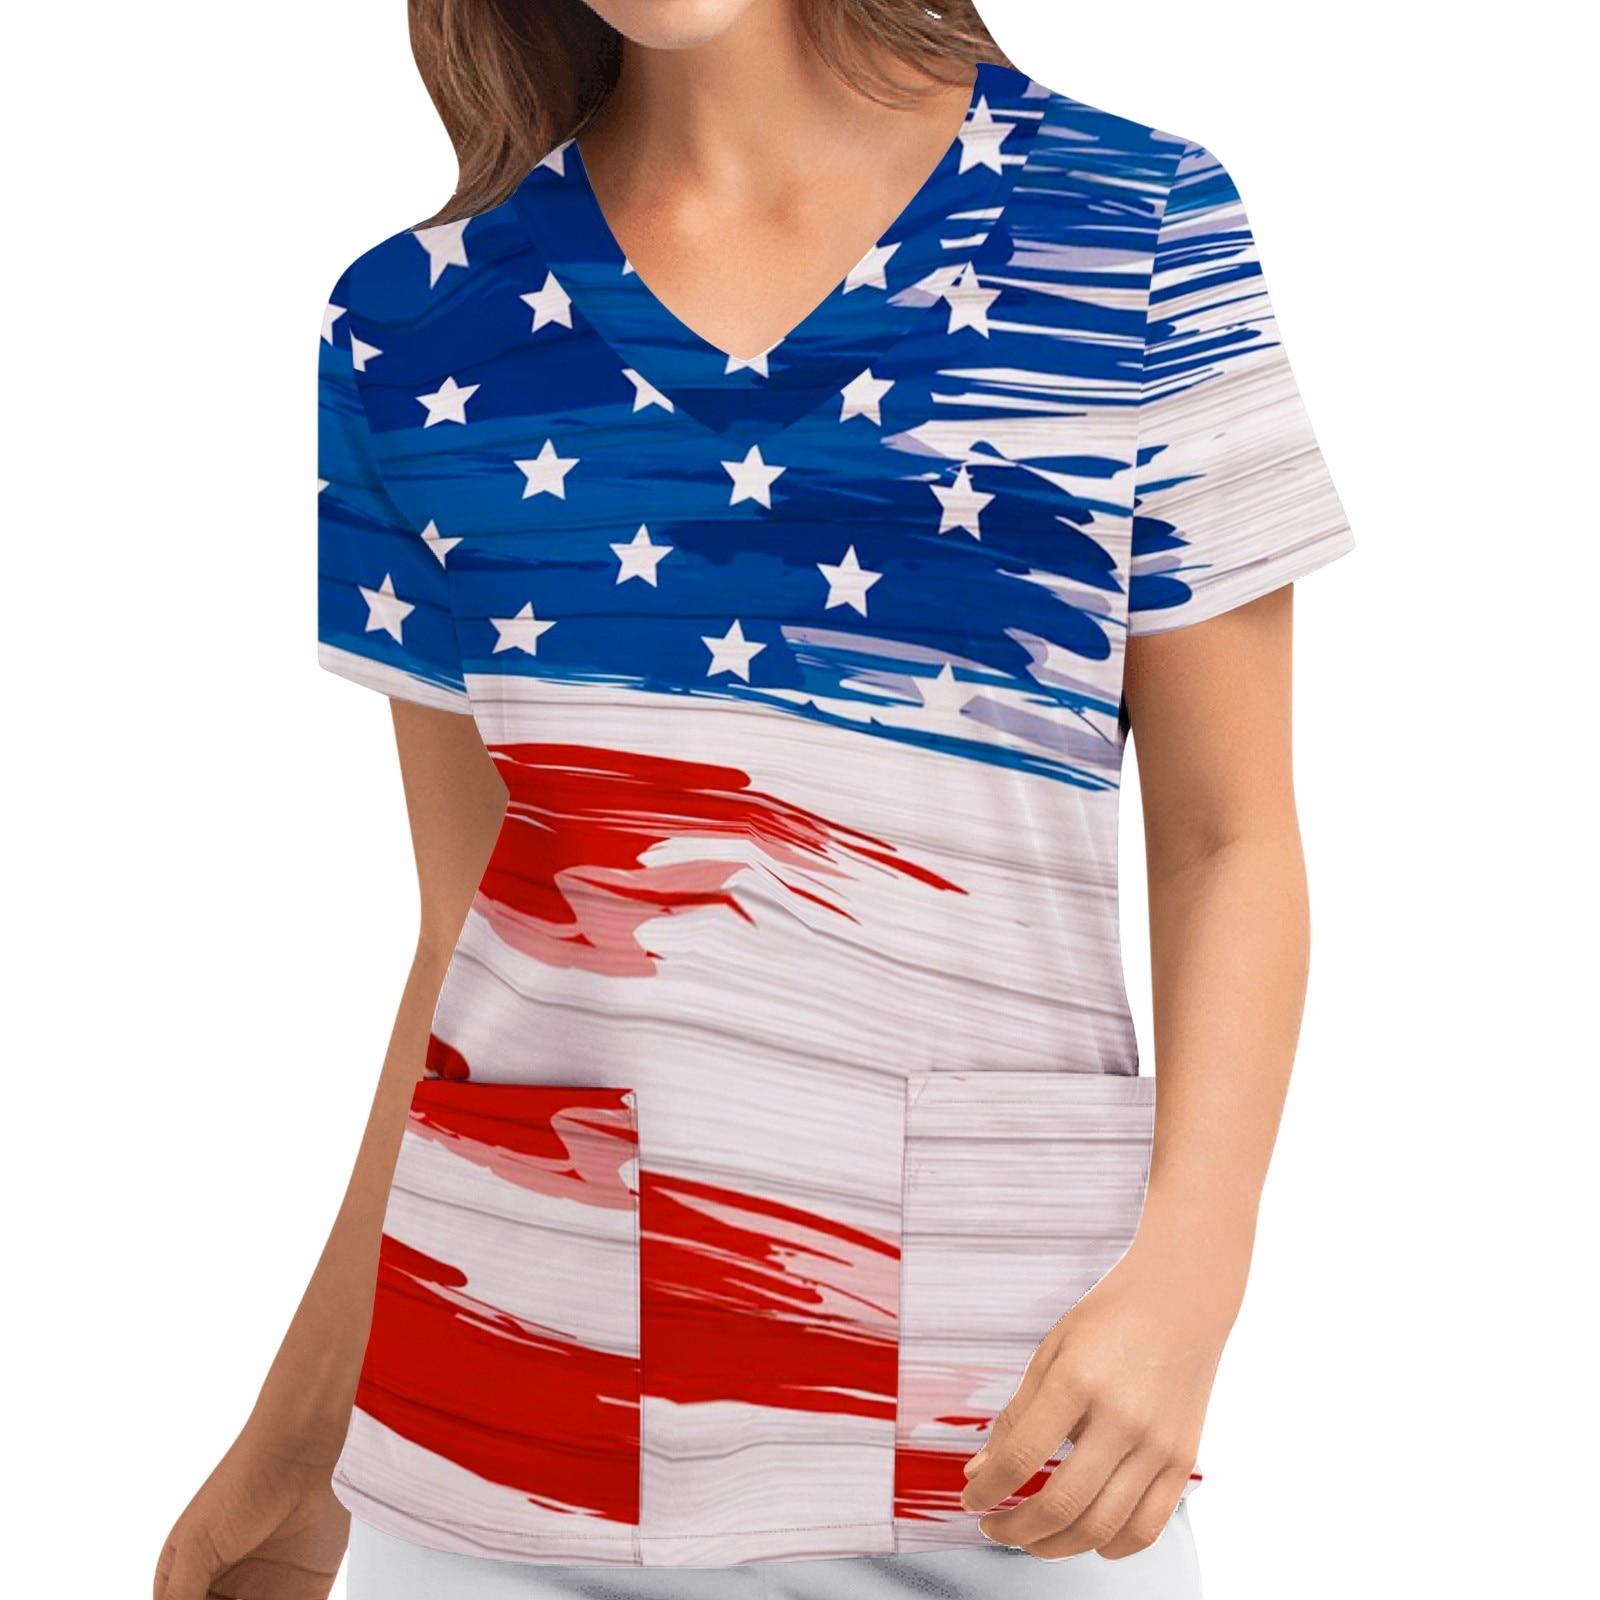 Independence Day Flag Print Scrubs Women Short Sleeve V-neck Carer Top Blouse Female Overalls Nurse Uniform Медицина Одежда A20